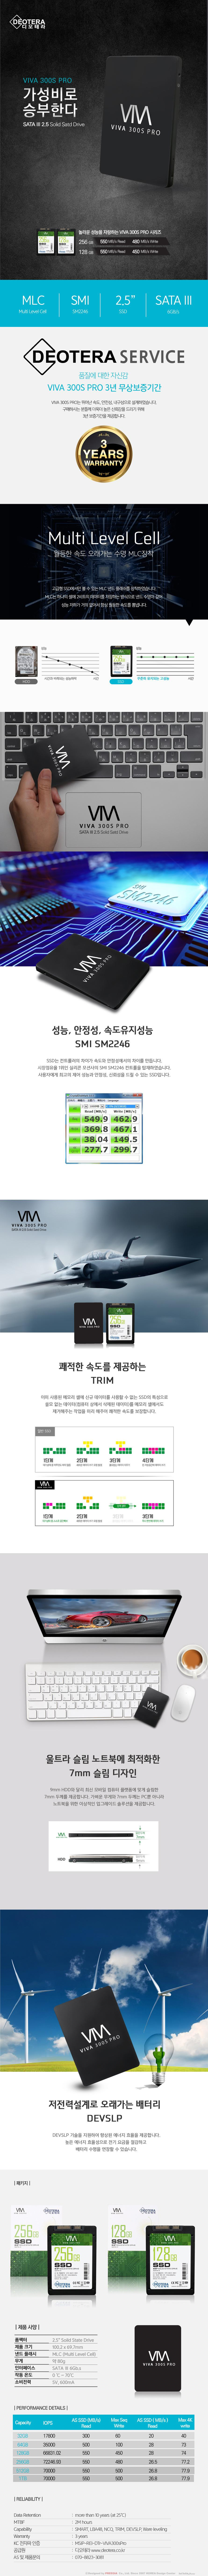 VIVA-300S-PRO_1TB.jpg